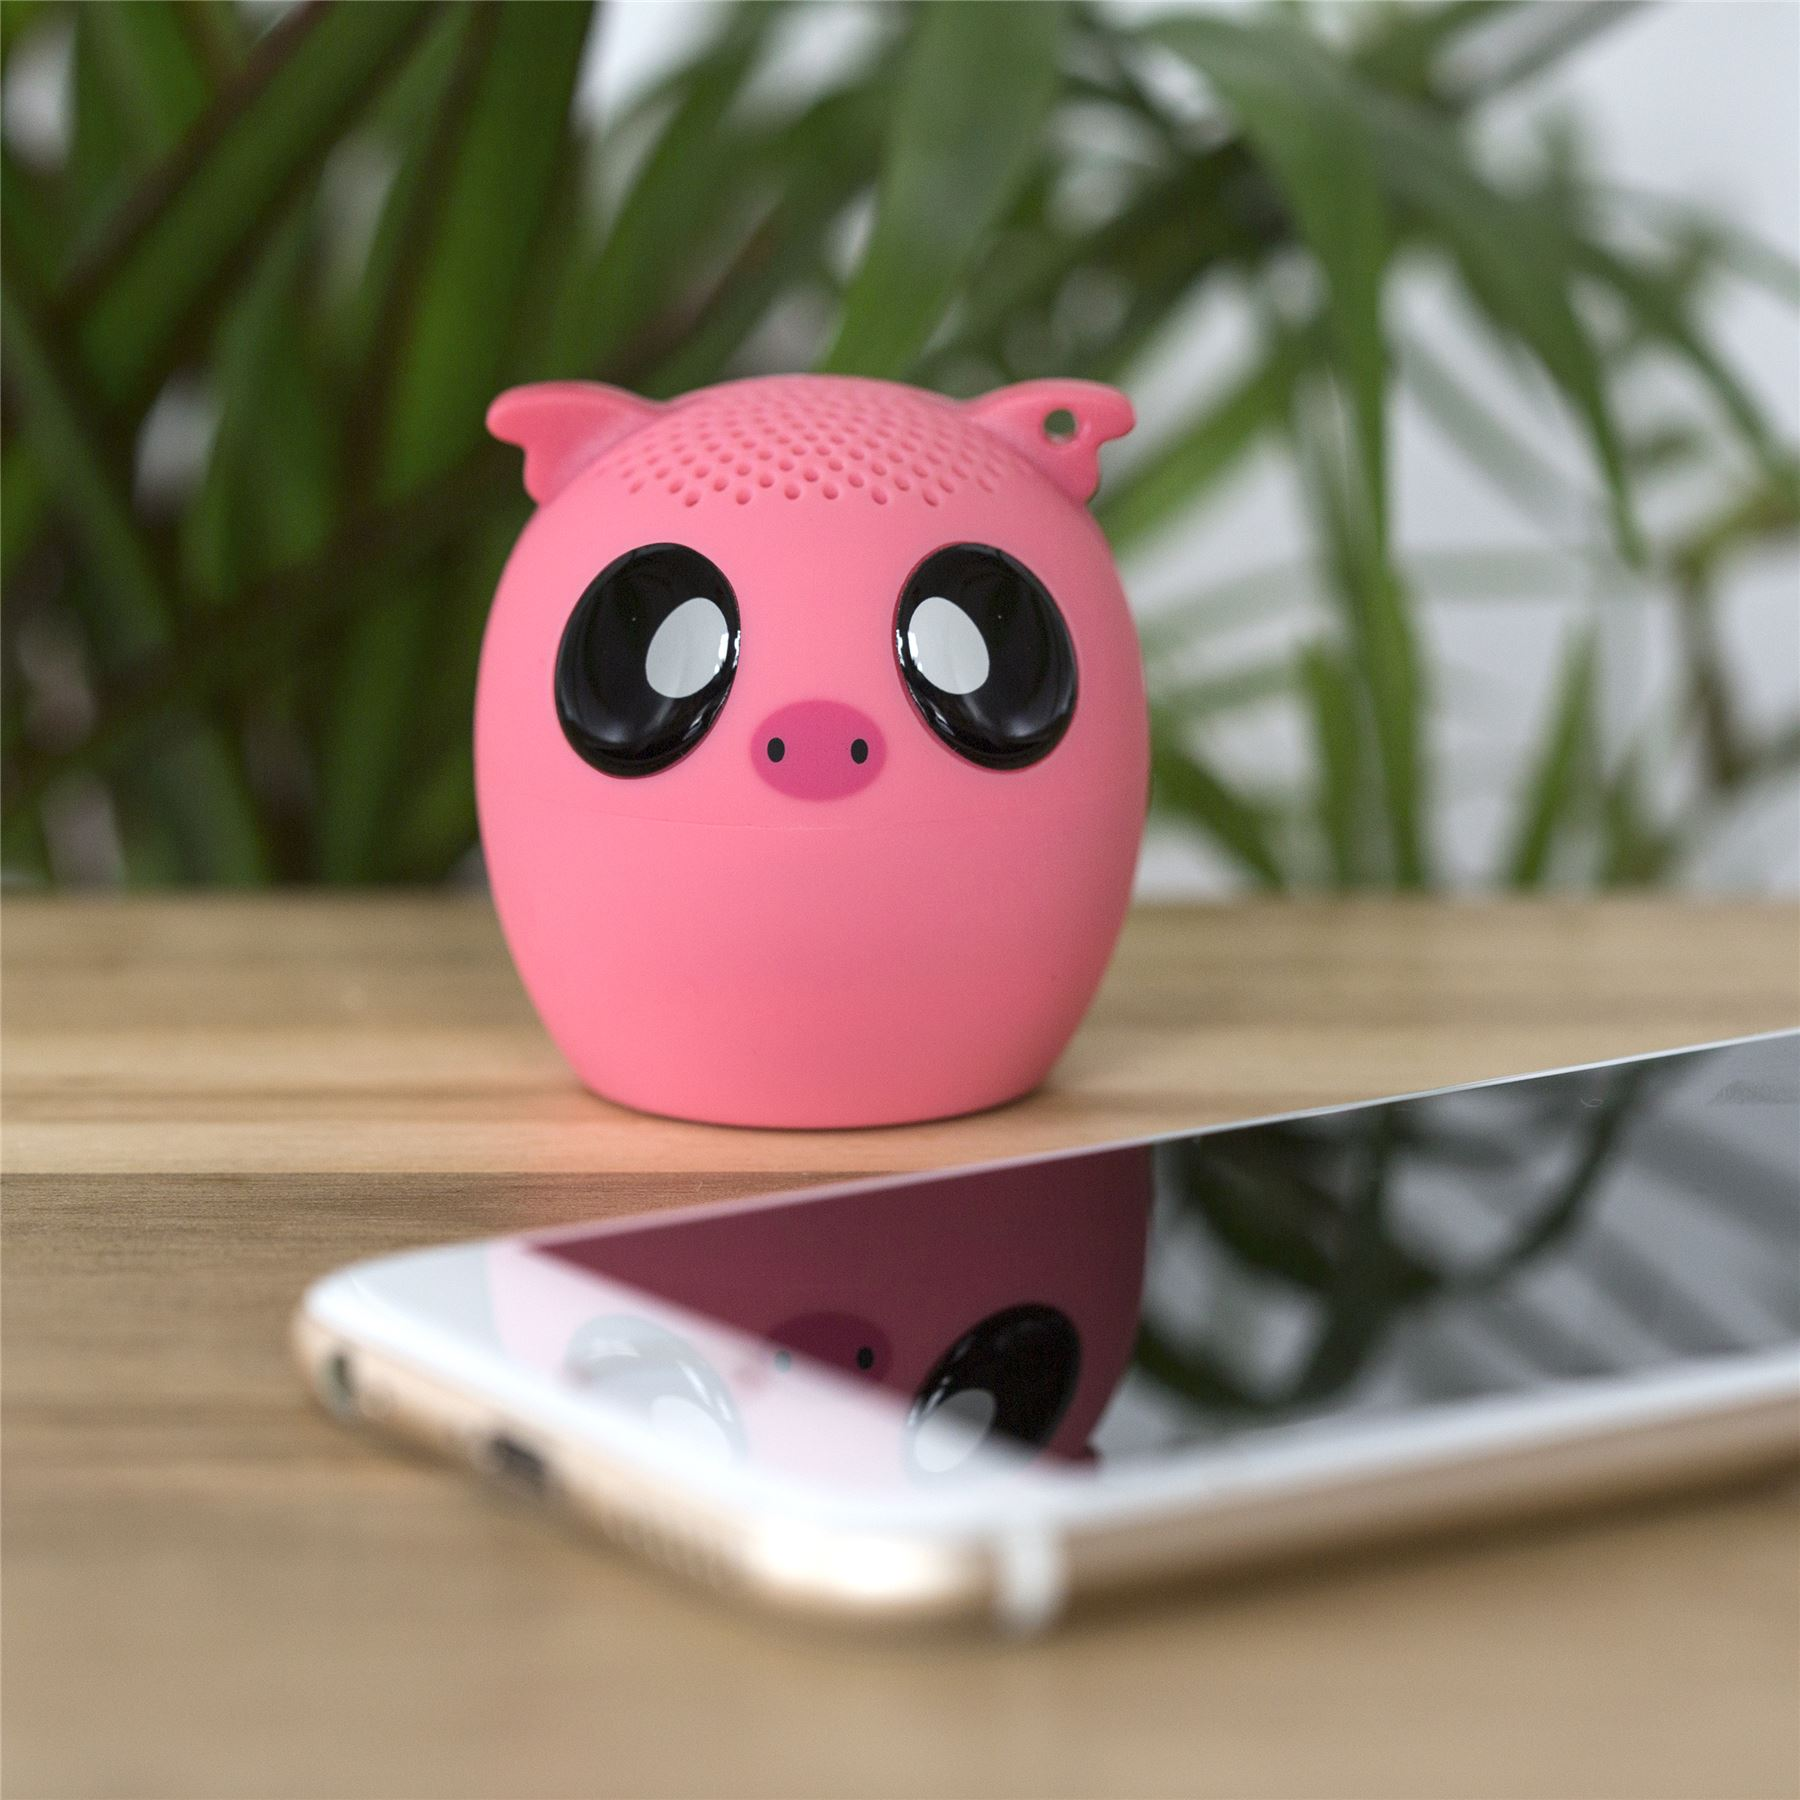 Thumbs Up Wireless Speaker, Pig